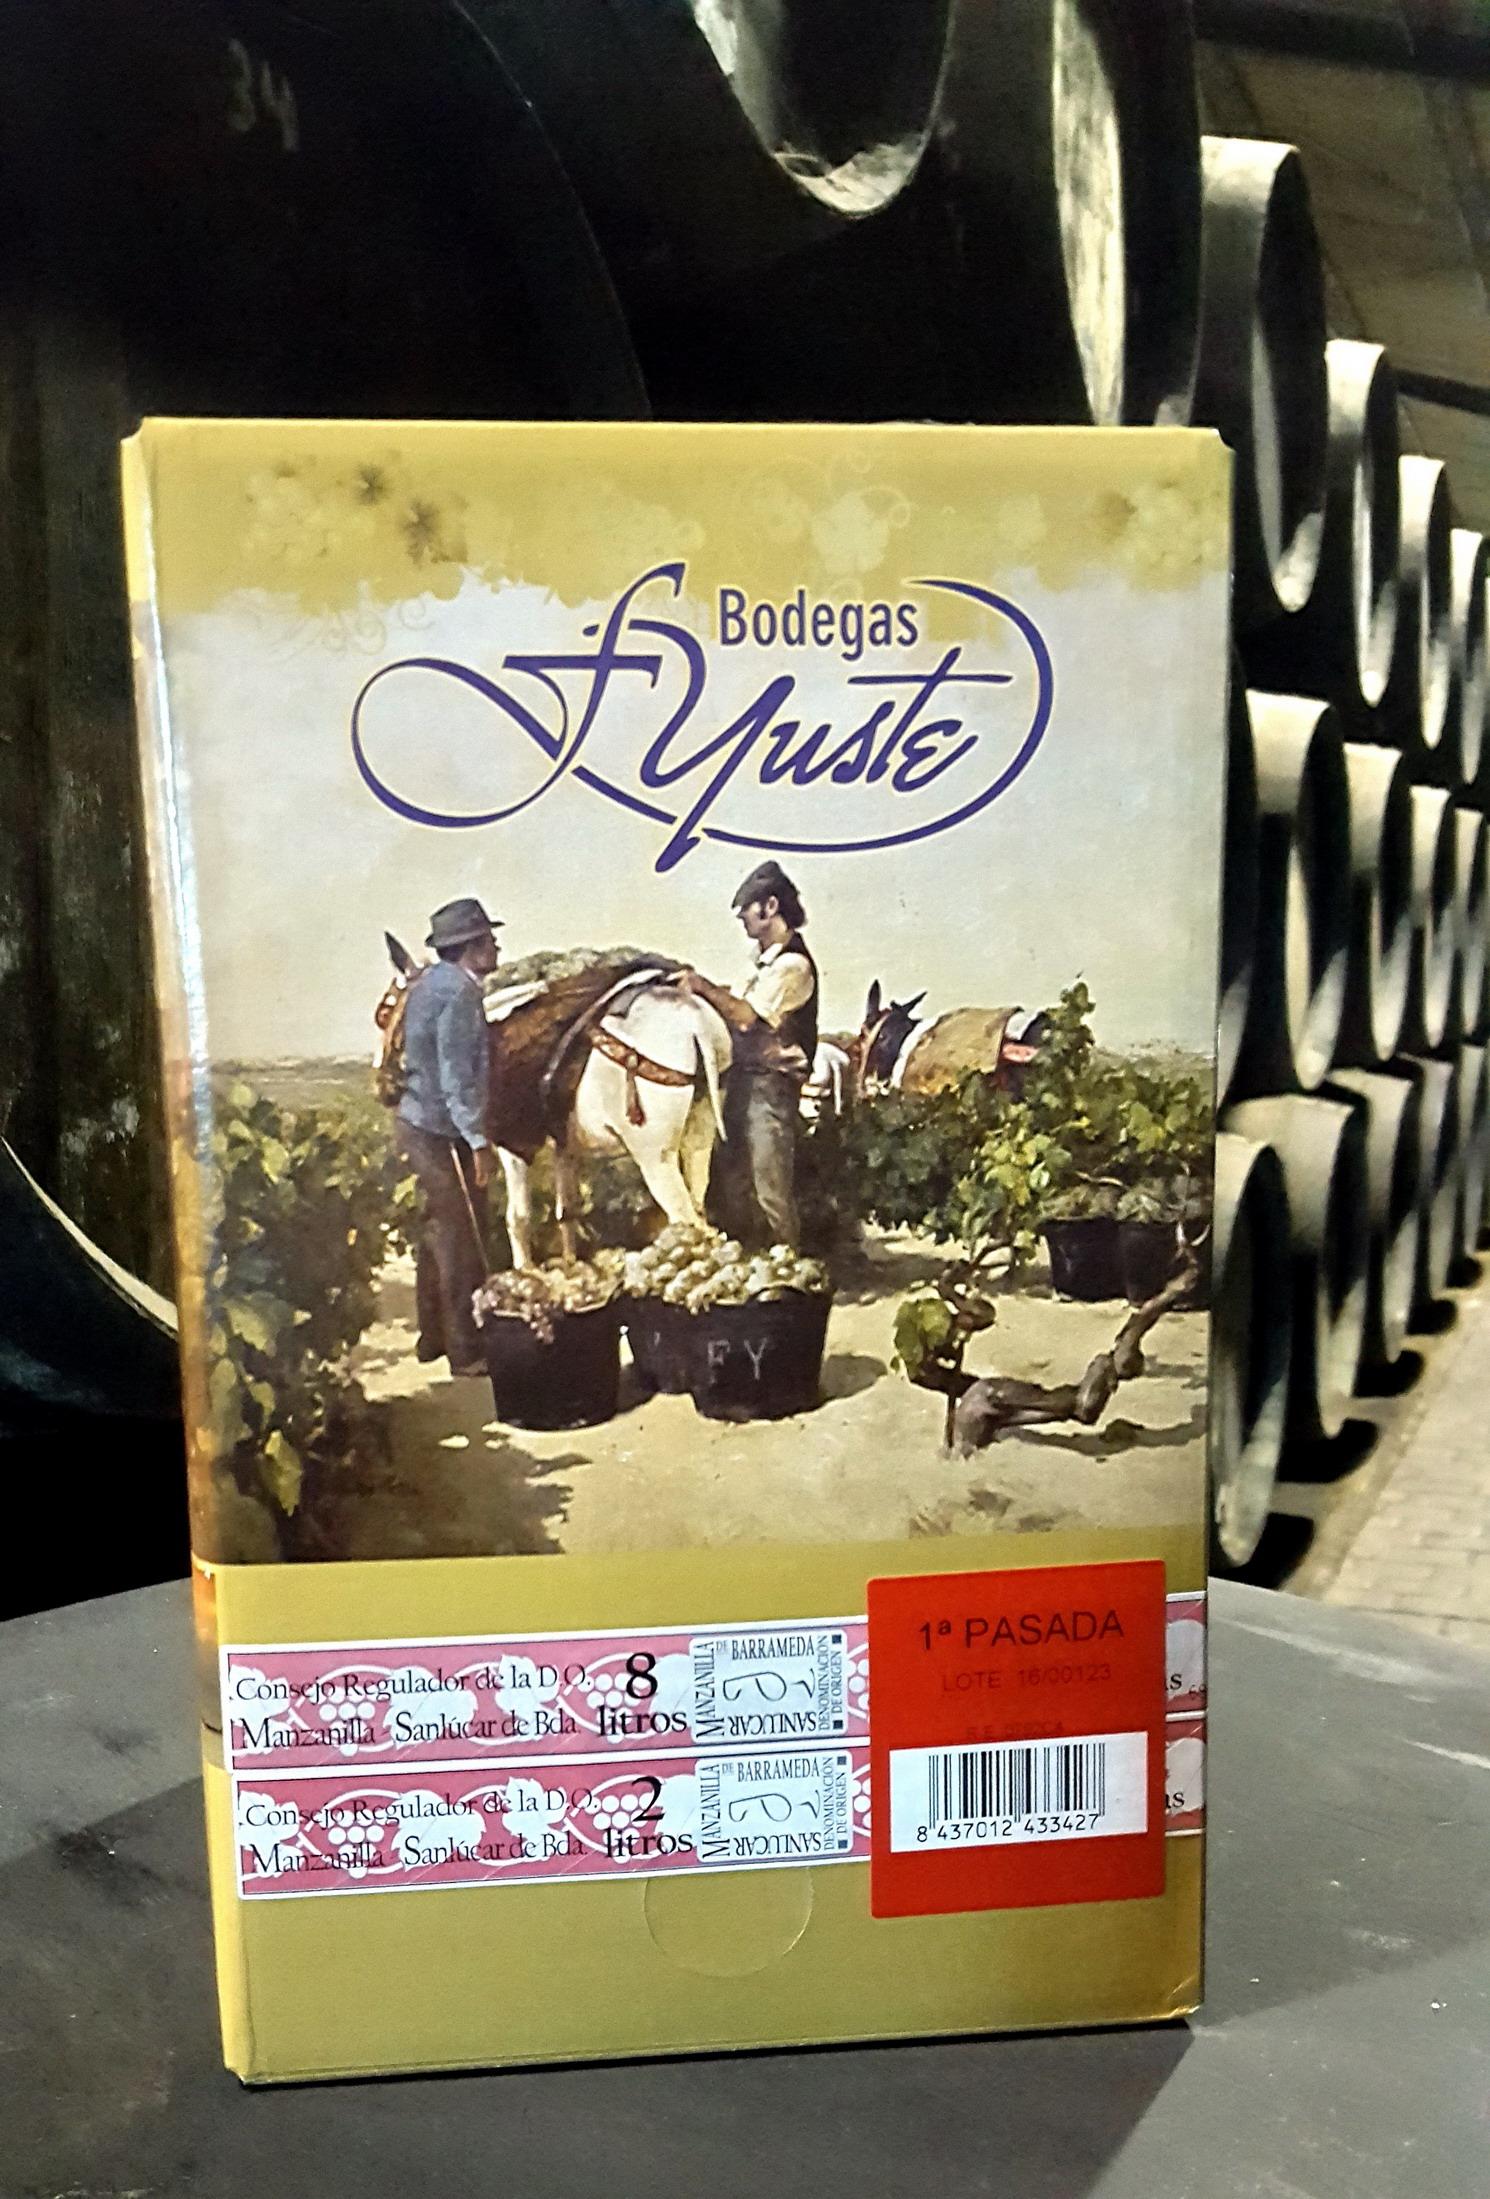 Manzanilla Pasada de Bodegas Yuste, Best Wine in Box en Francia